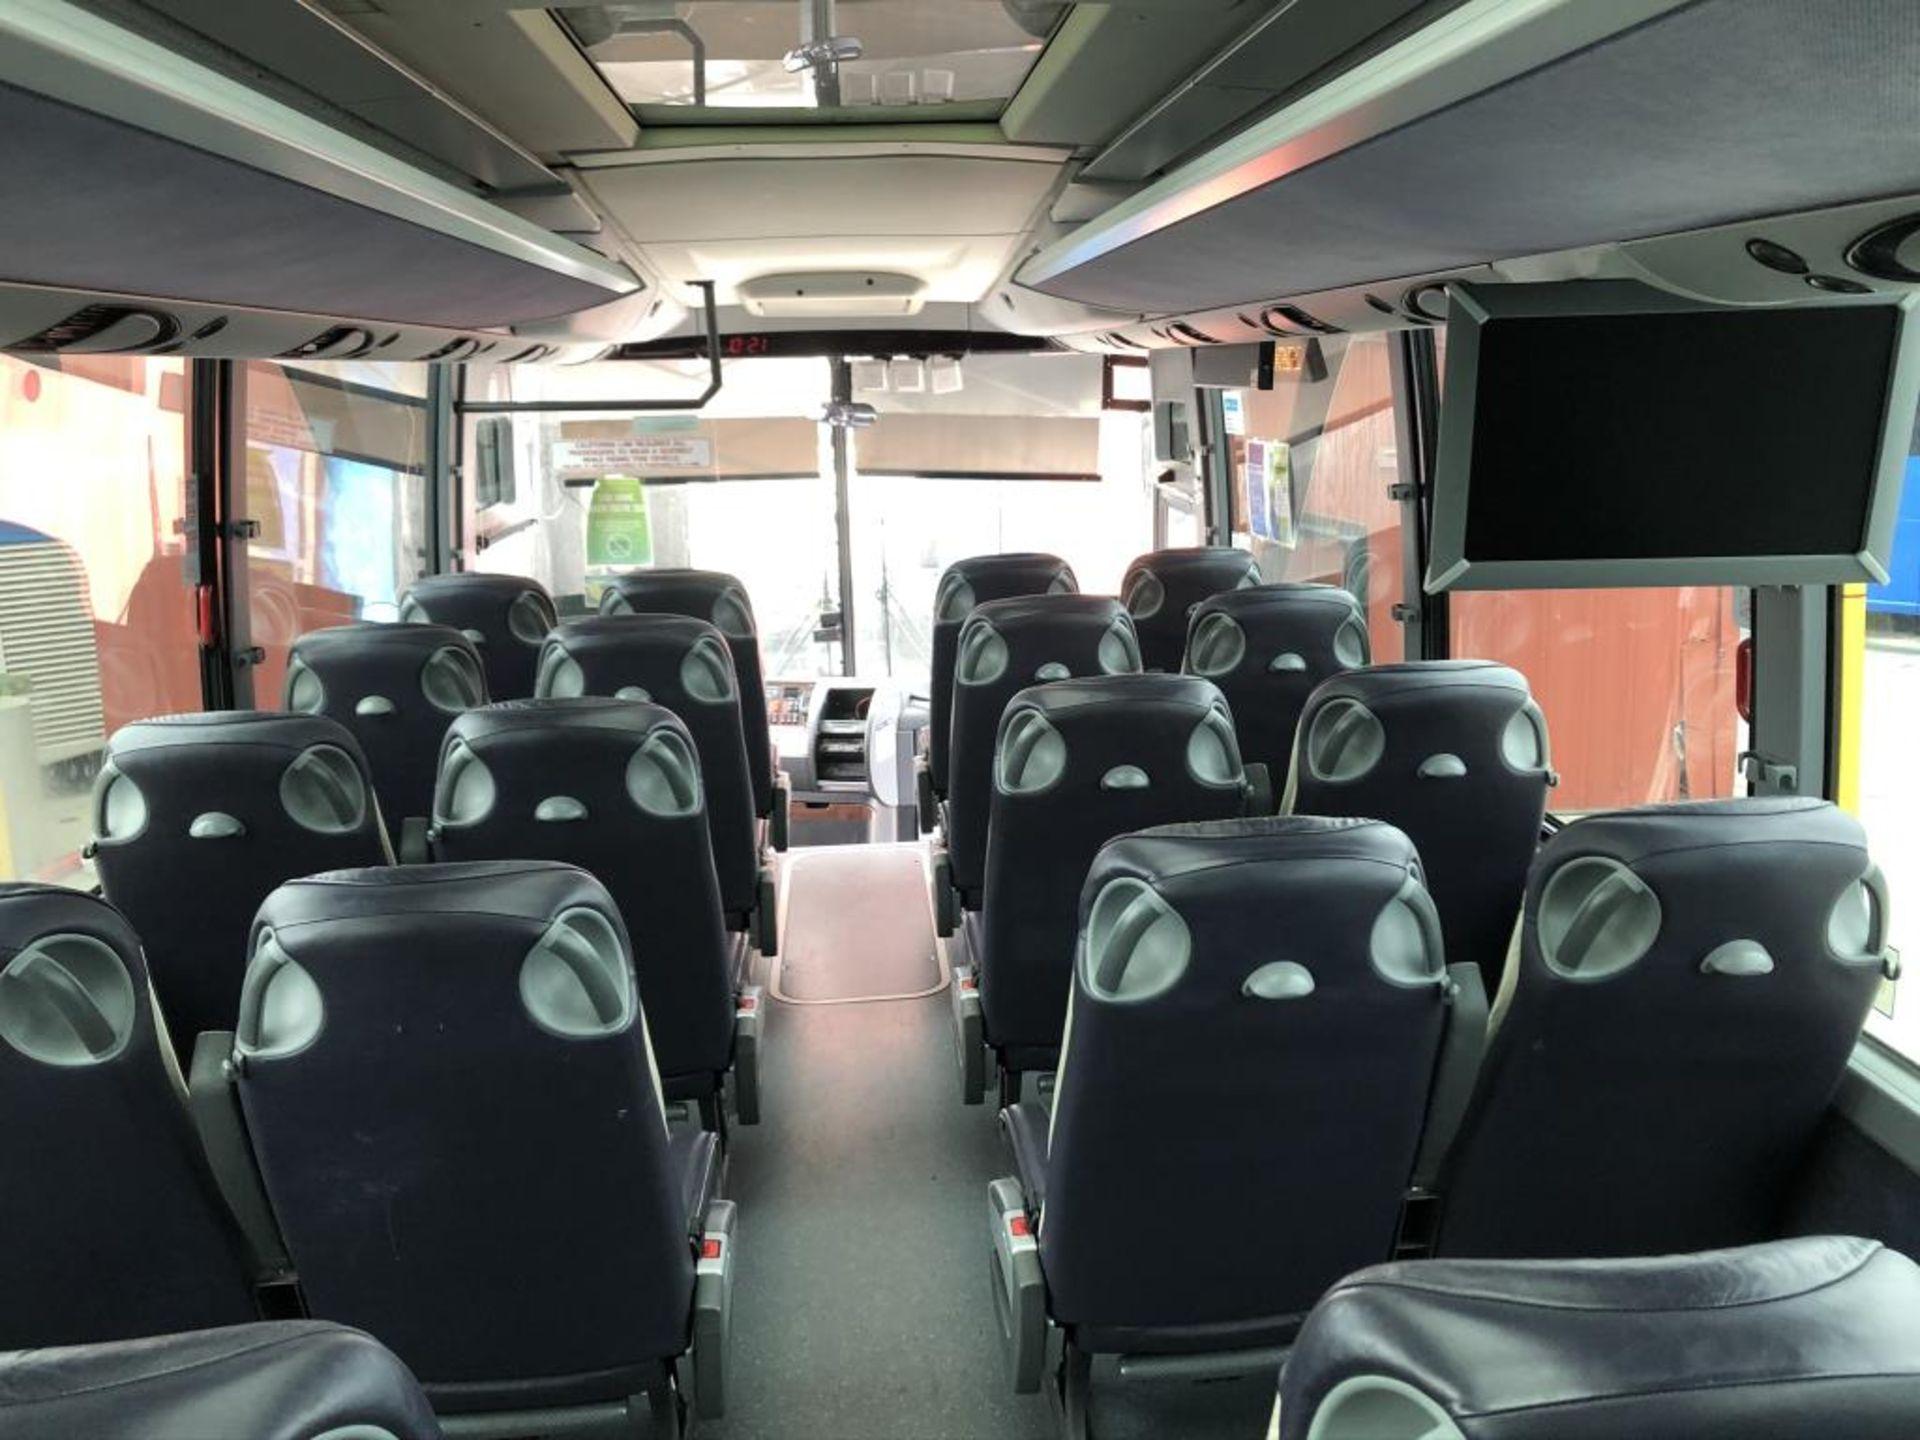 Motor Coach - Image 11 of 17